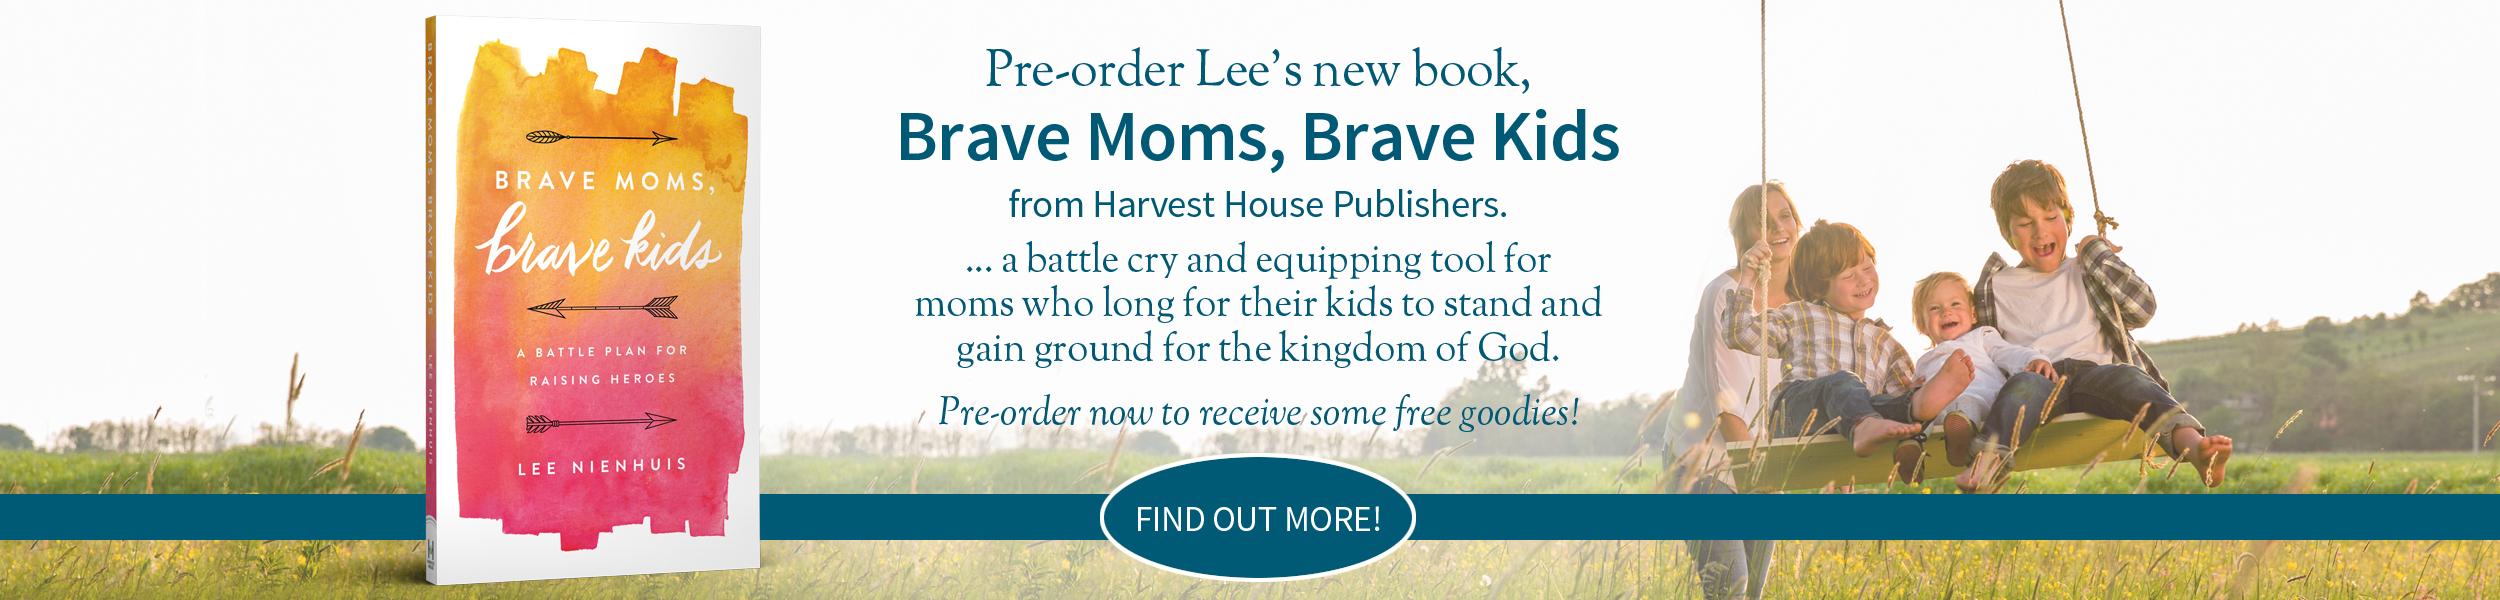 Lee Nienhuis - Brave Moms, Brave Kids